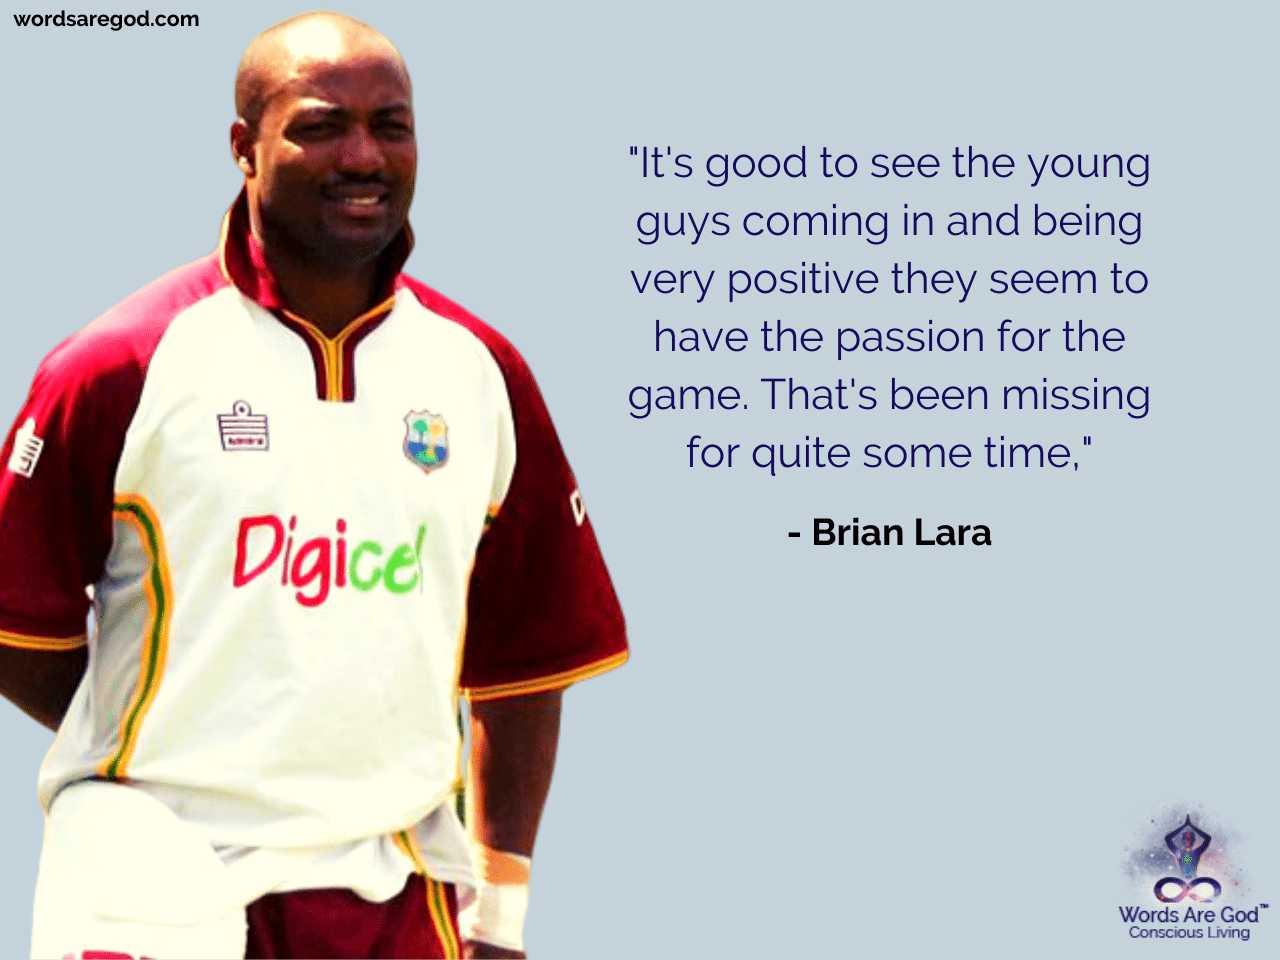 Brian Lara Inspirational Quote